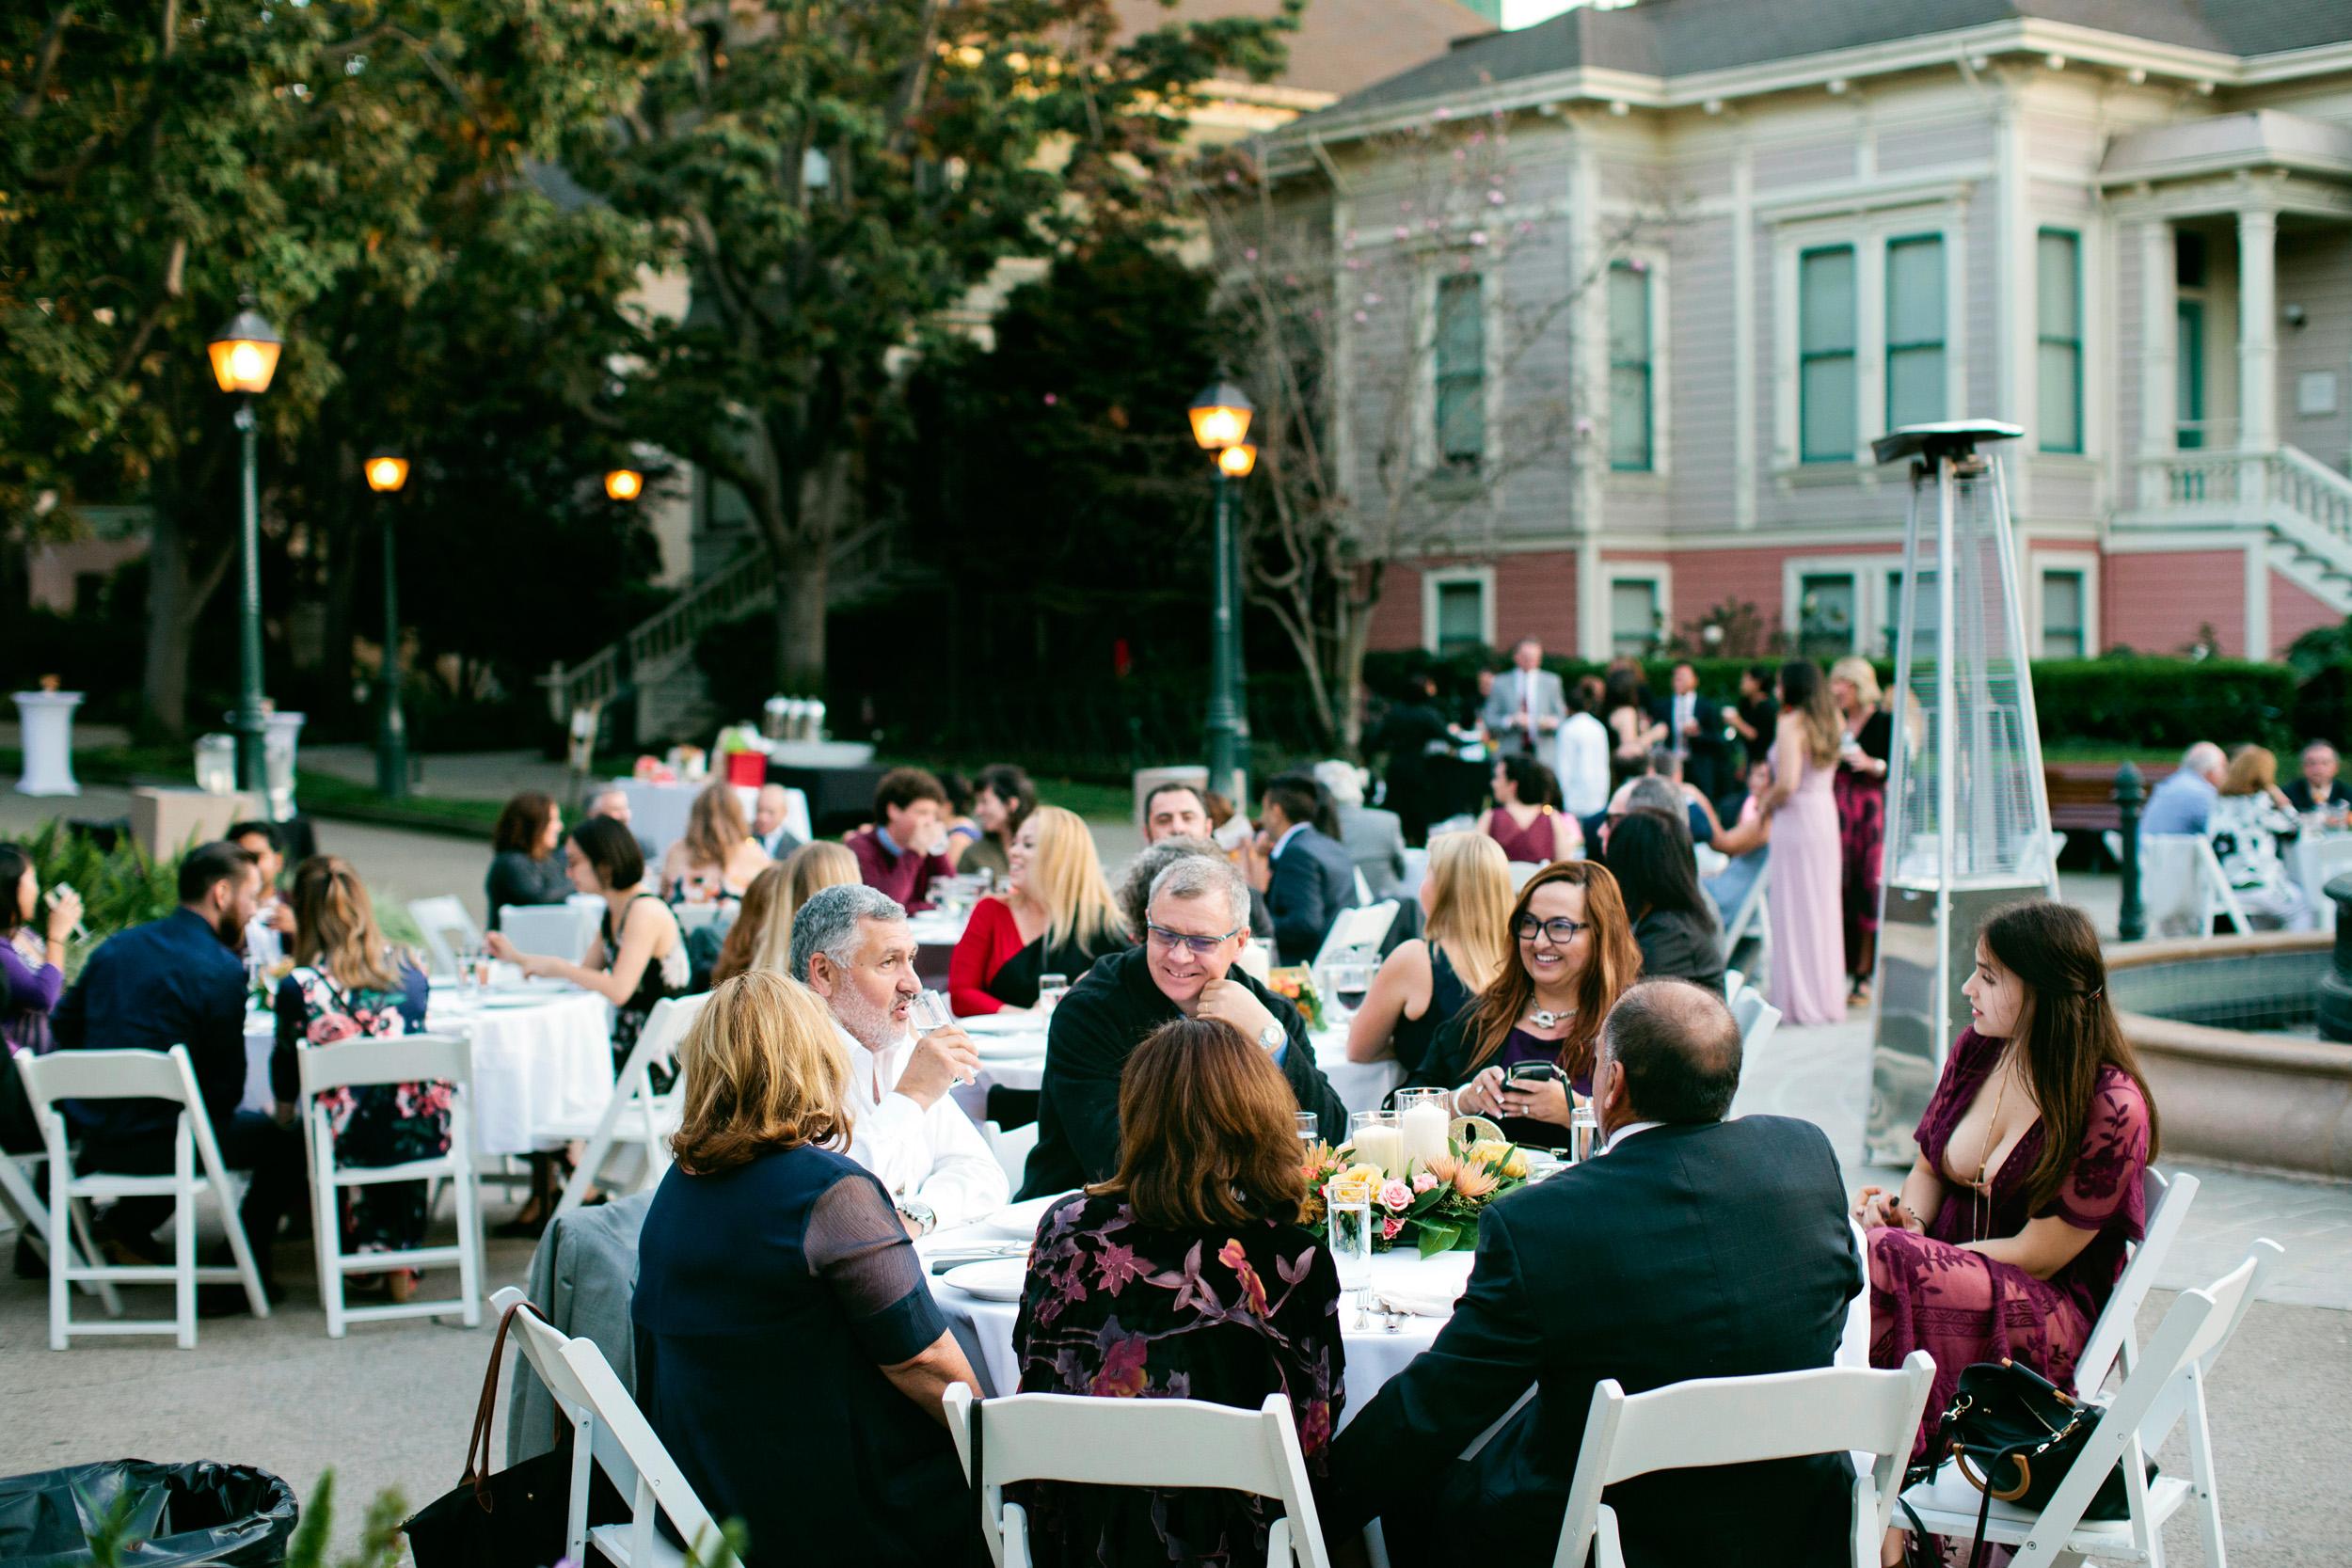 Oakland-Preservation-Park-Wedding-036.JPG